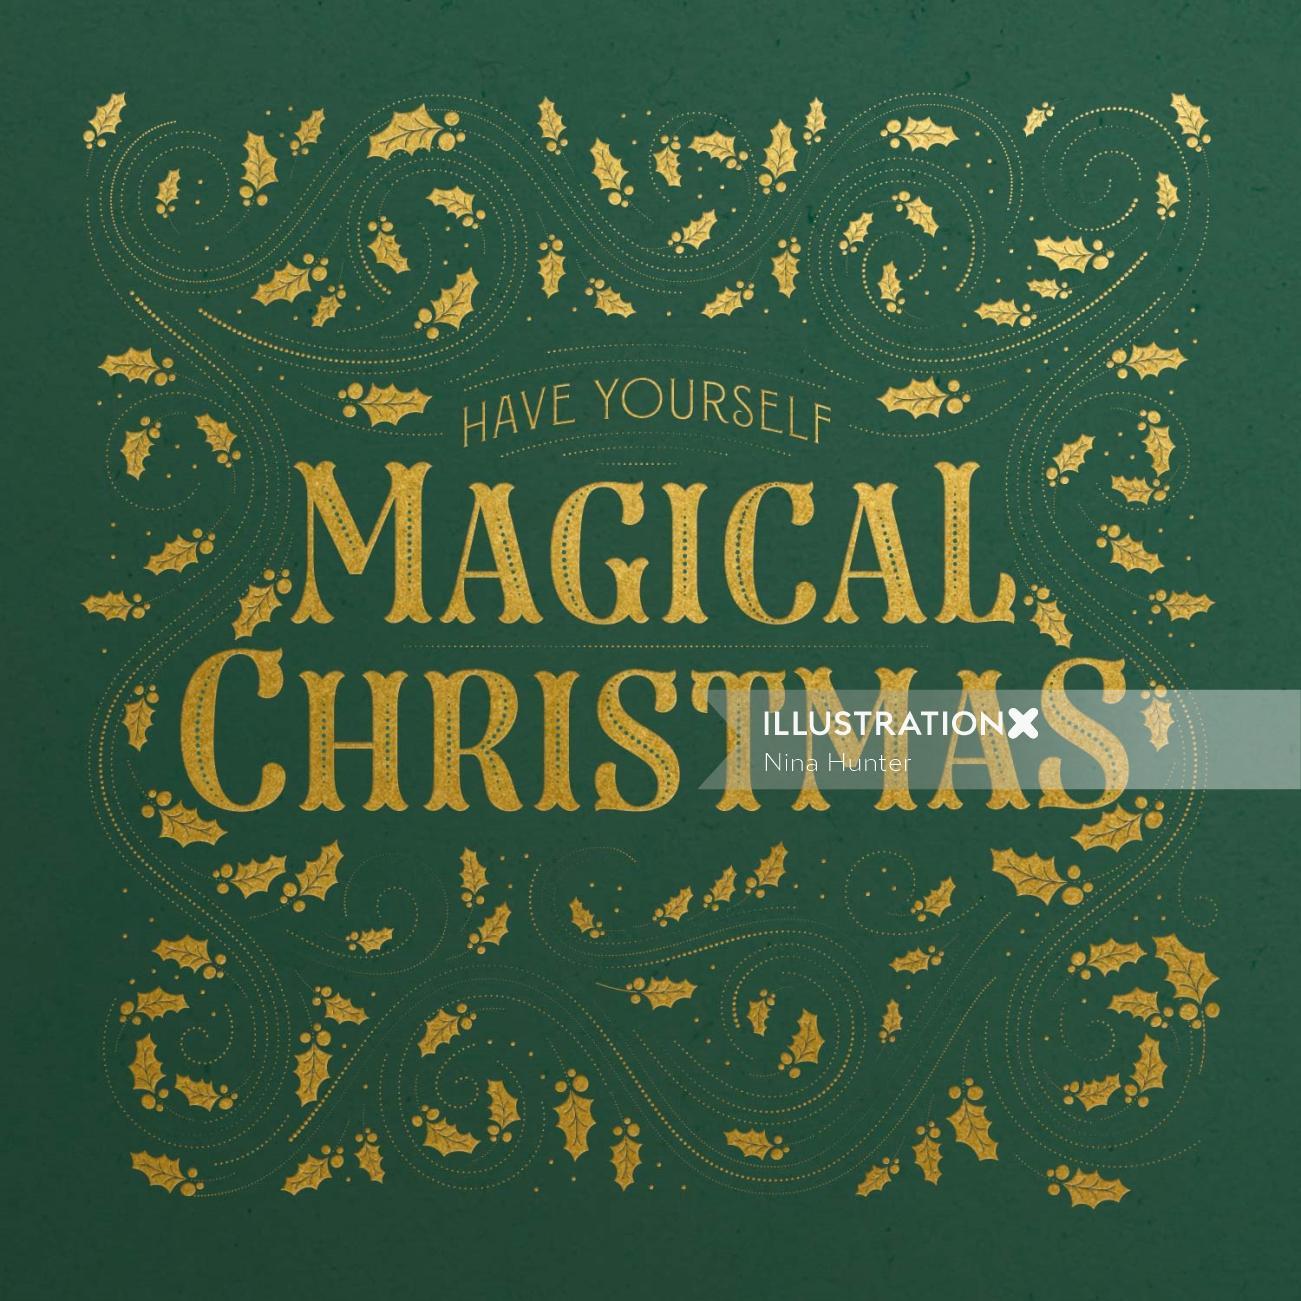 Decorative illustration of Christmas Card